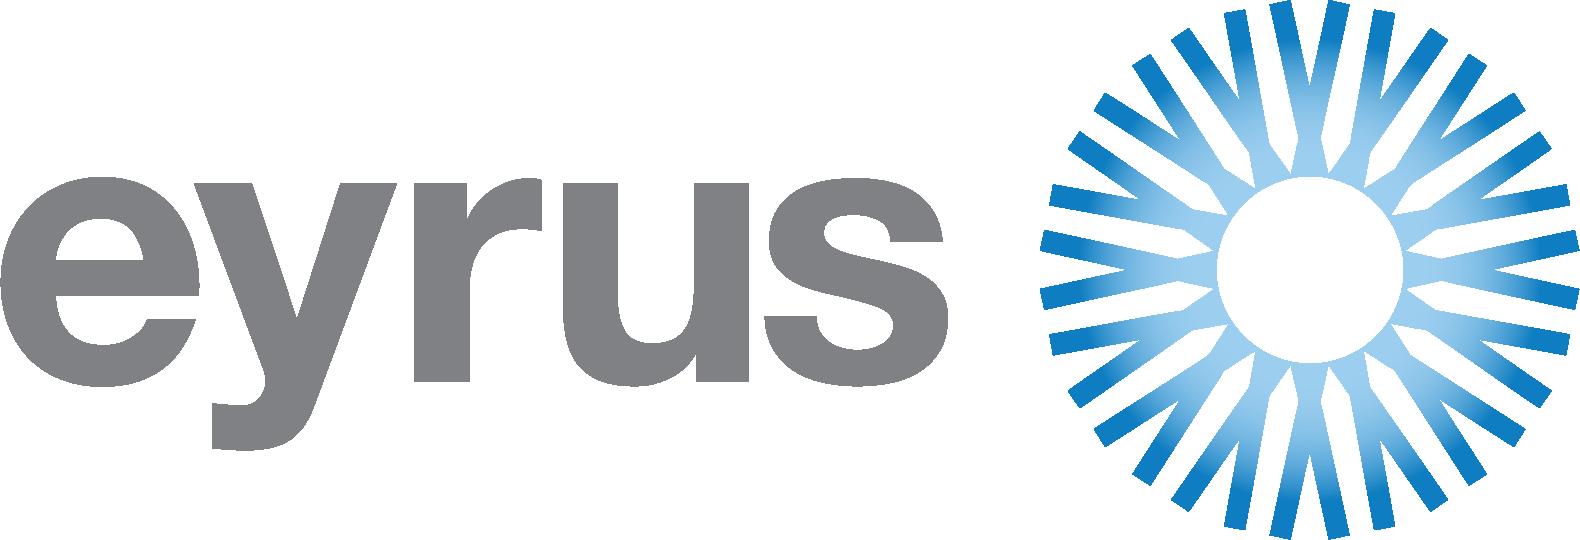 eyrus_logo_fullcolor